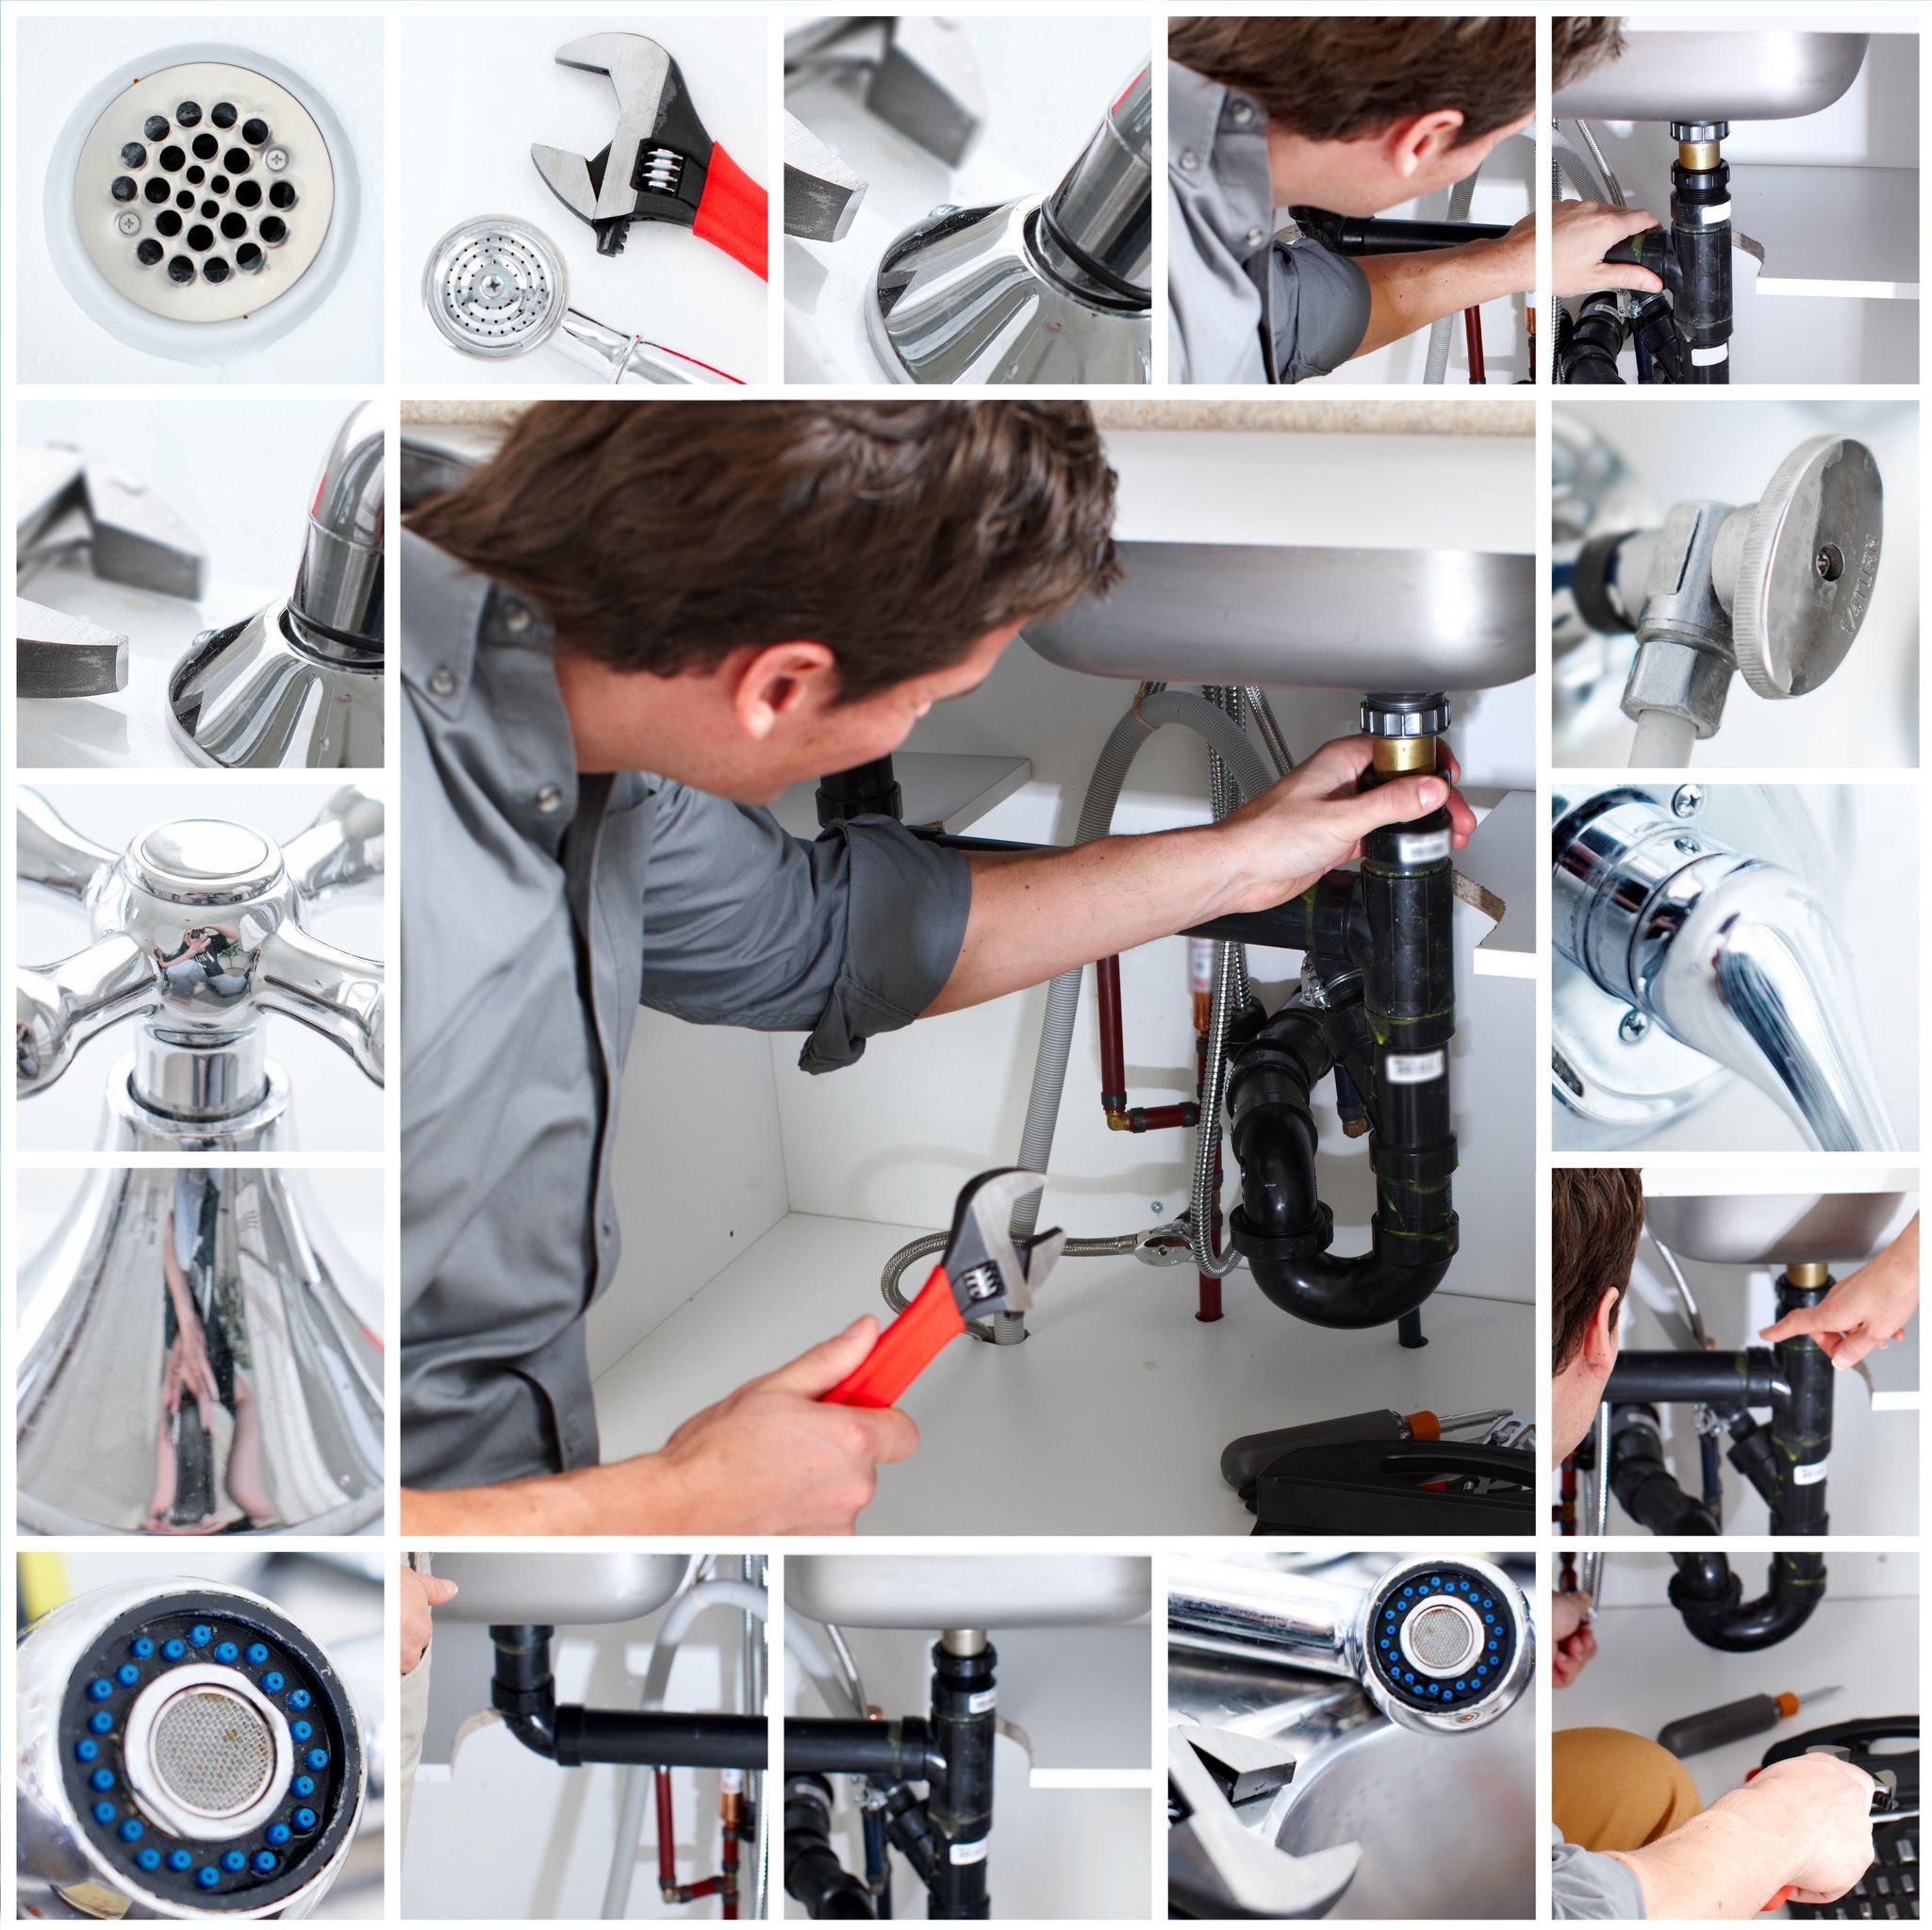 handyman plumber